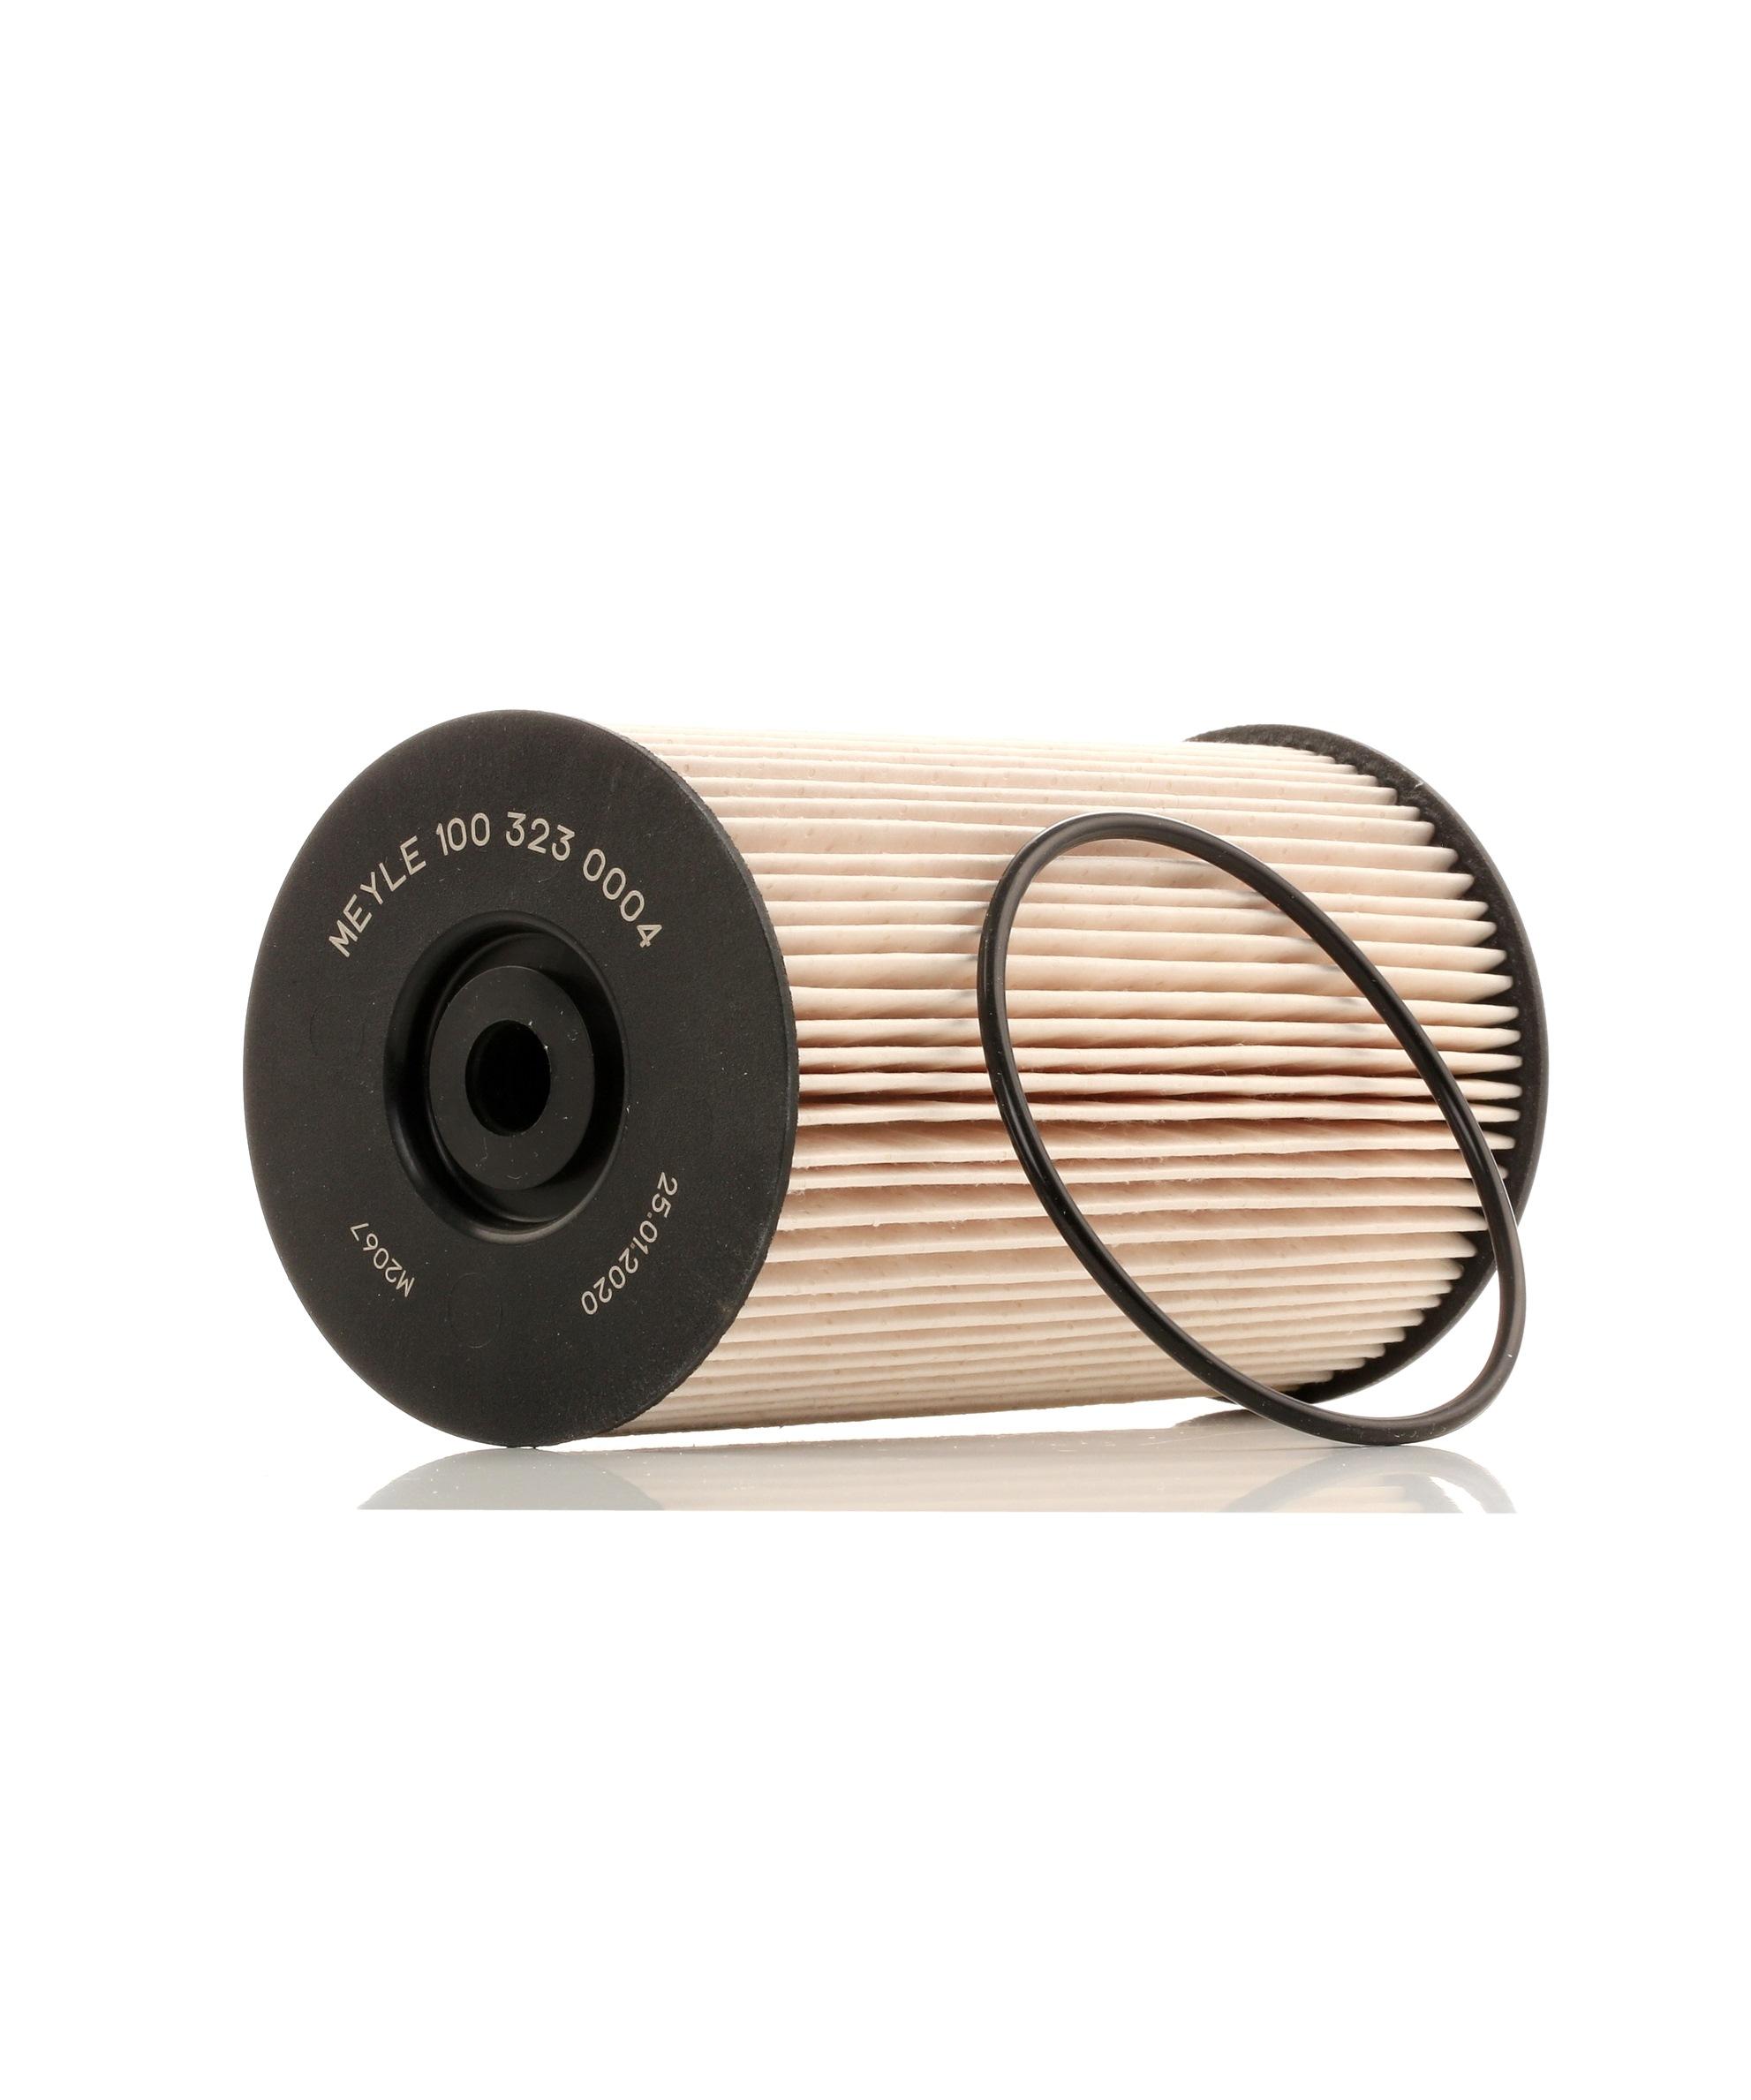 Fuel filter MEYLE 100 323 0004 rating